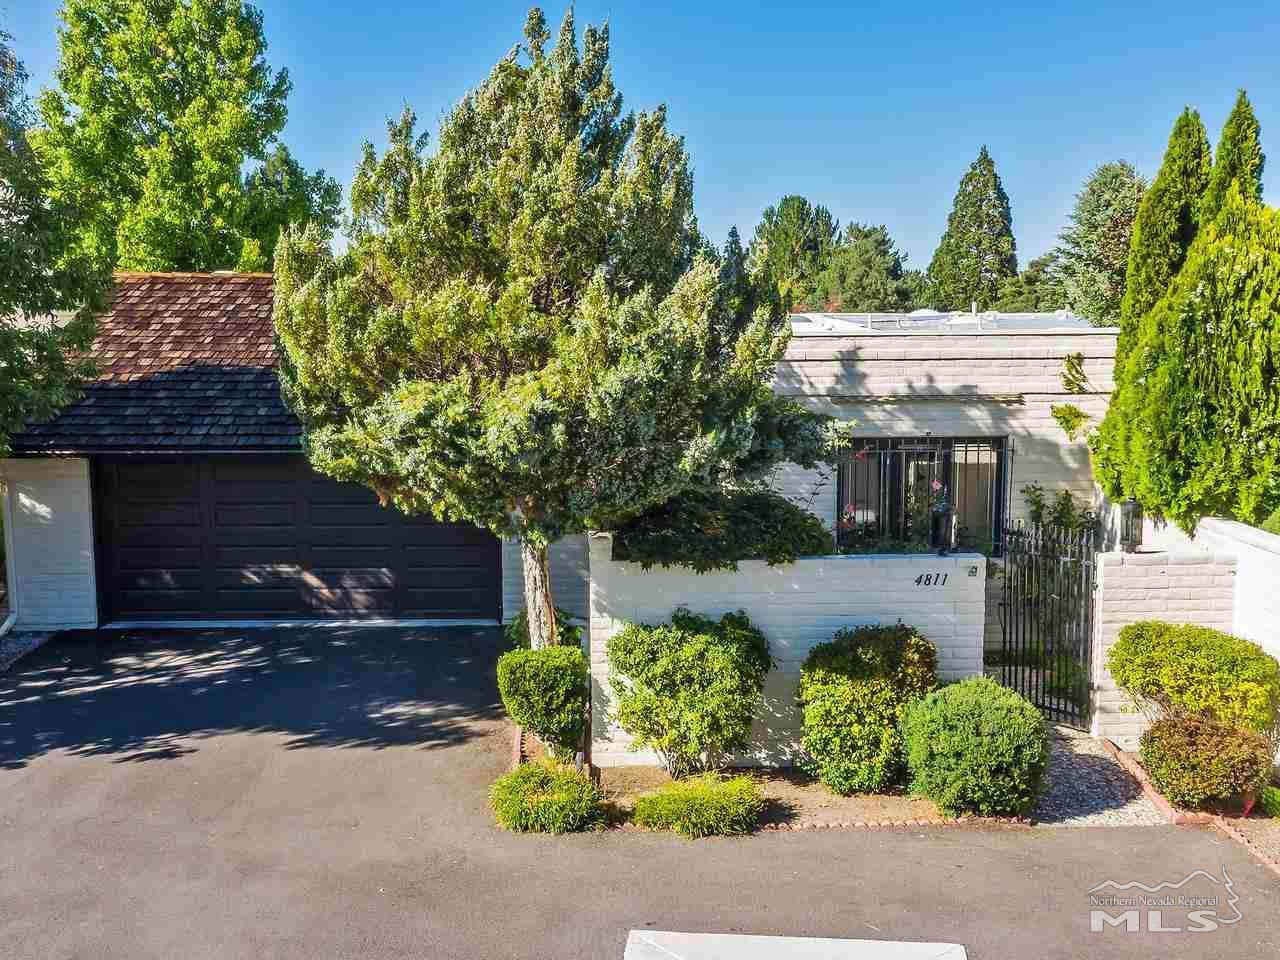 4811 Lakeridge Terrace West - Photo 1